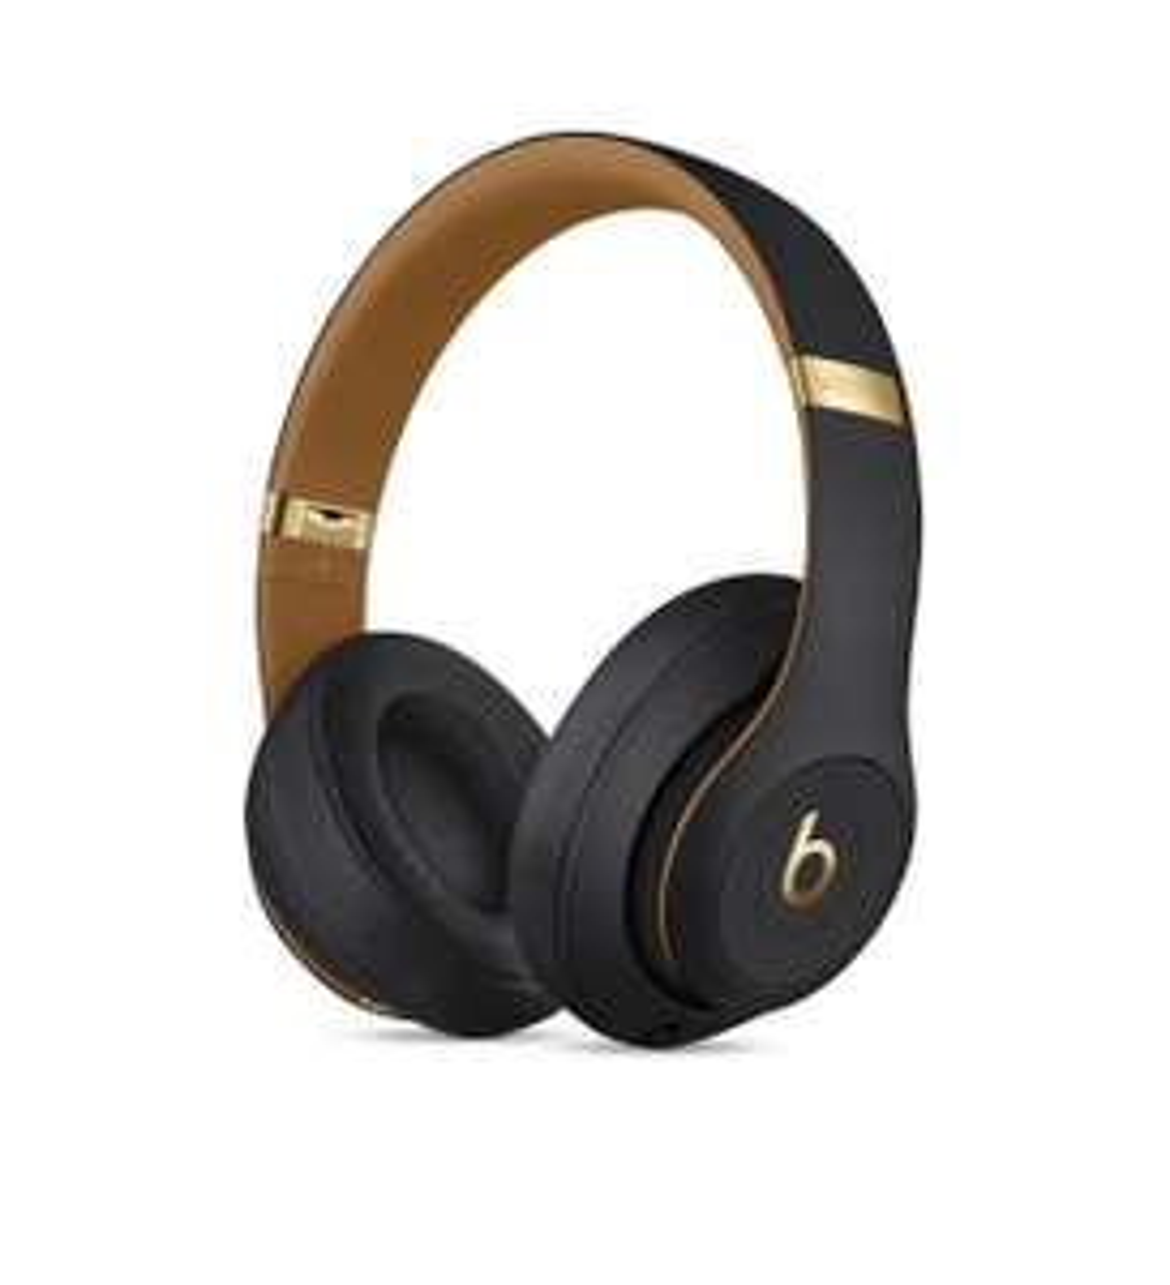 [Cyberport] Beats Studio3 Wireless Over-Ear Skyline Collection Kopfhörer Nachtschwarz